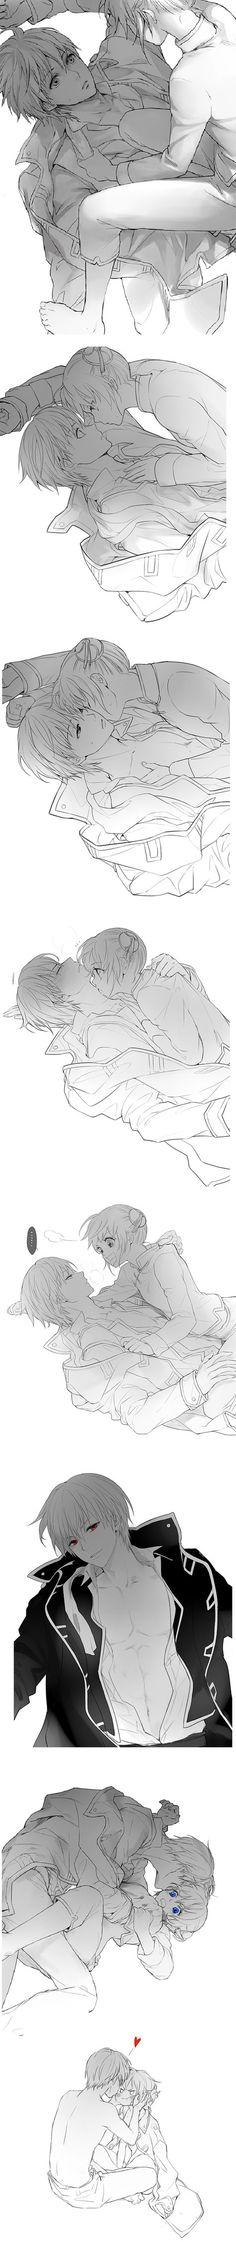 Steamy okikagu. Gintama anime, Kagura and Okita. fanart by LOLI @ pixiv